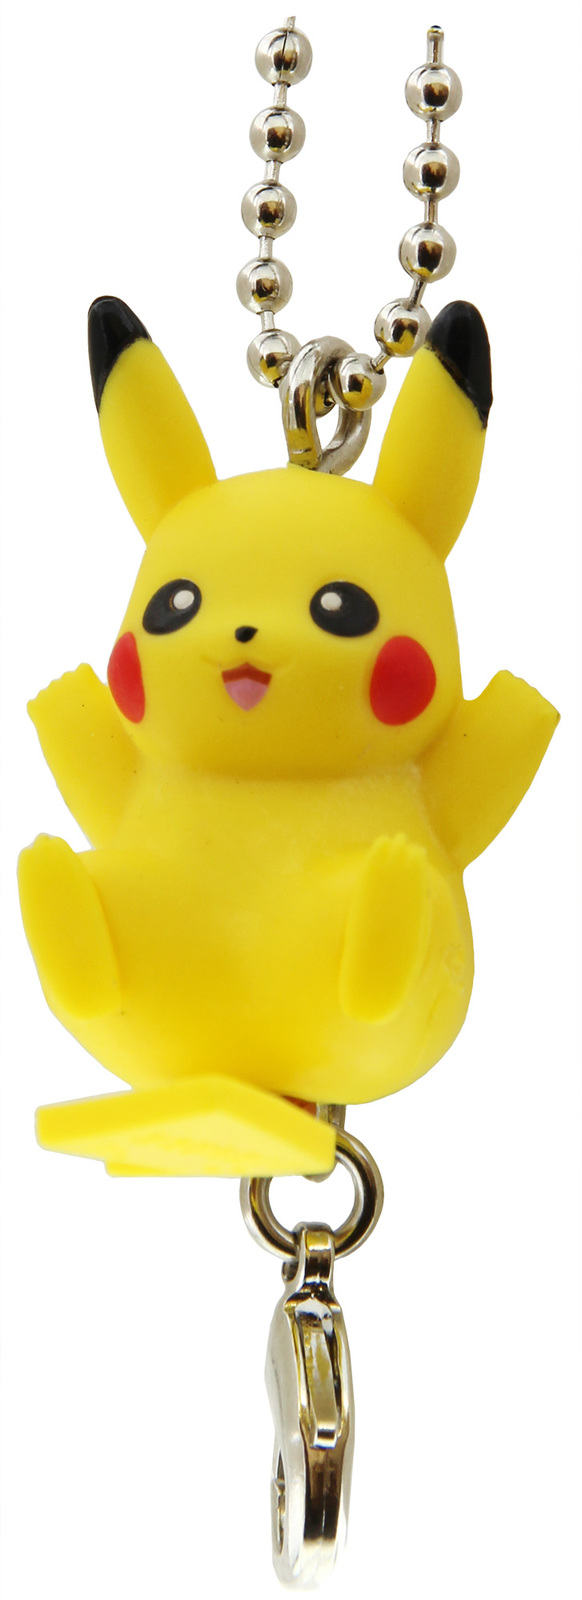 Pokemon Pinching Amp Connecting Mascot Charm Blind Box